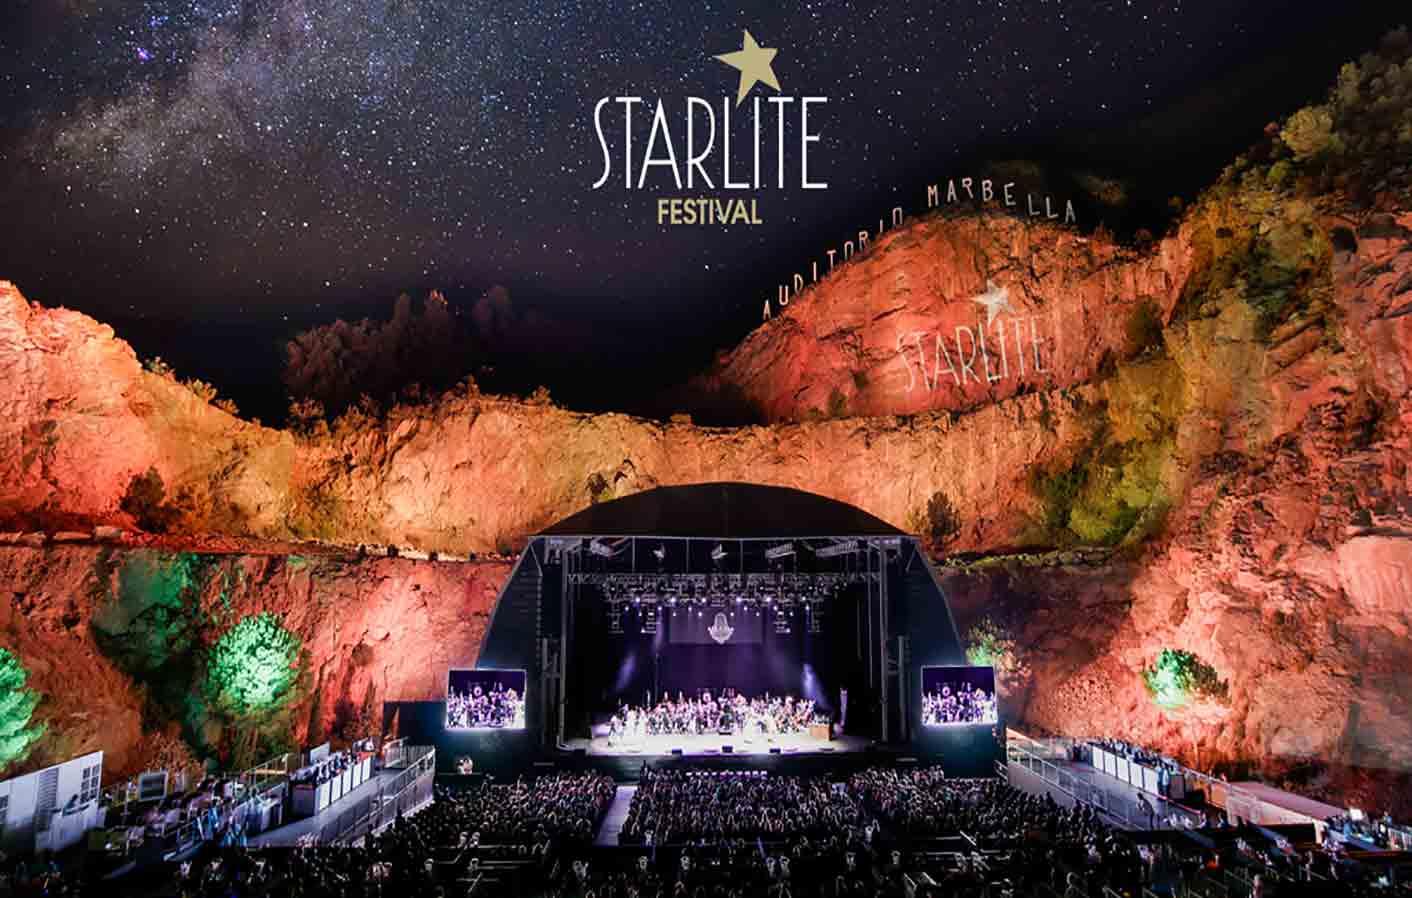 STARLITE-AUDITORIO